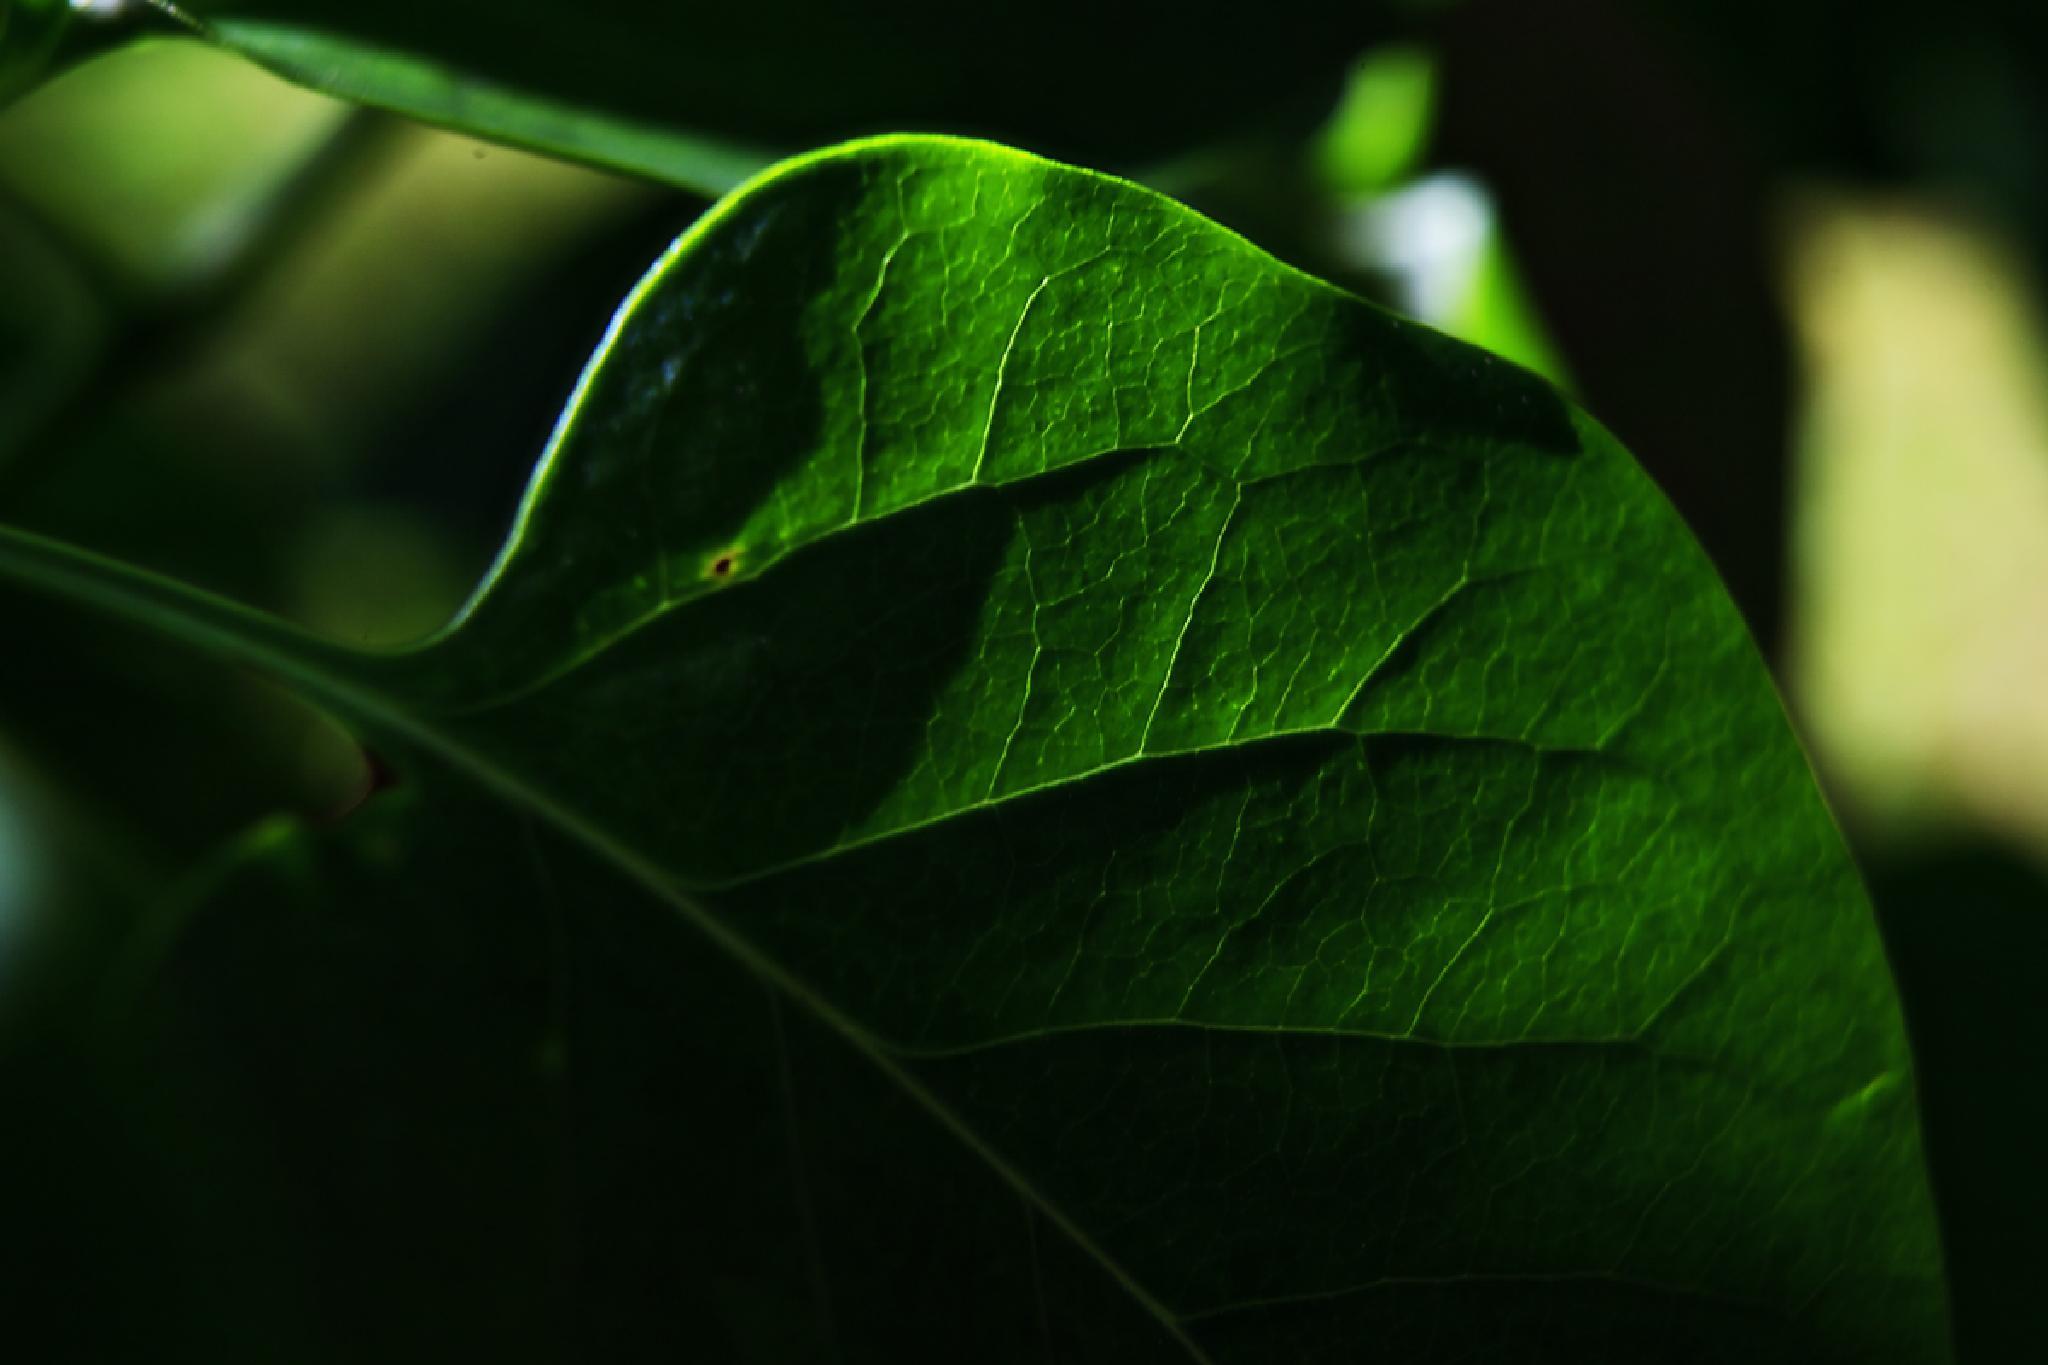 I Am green by enrico.seri.16